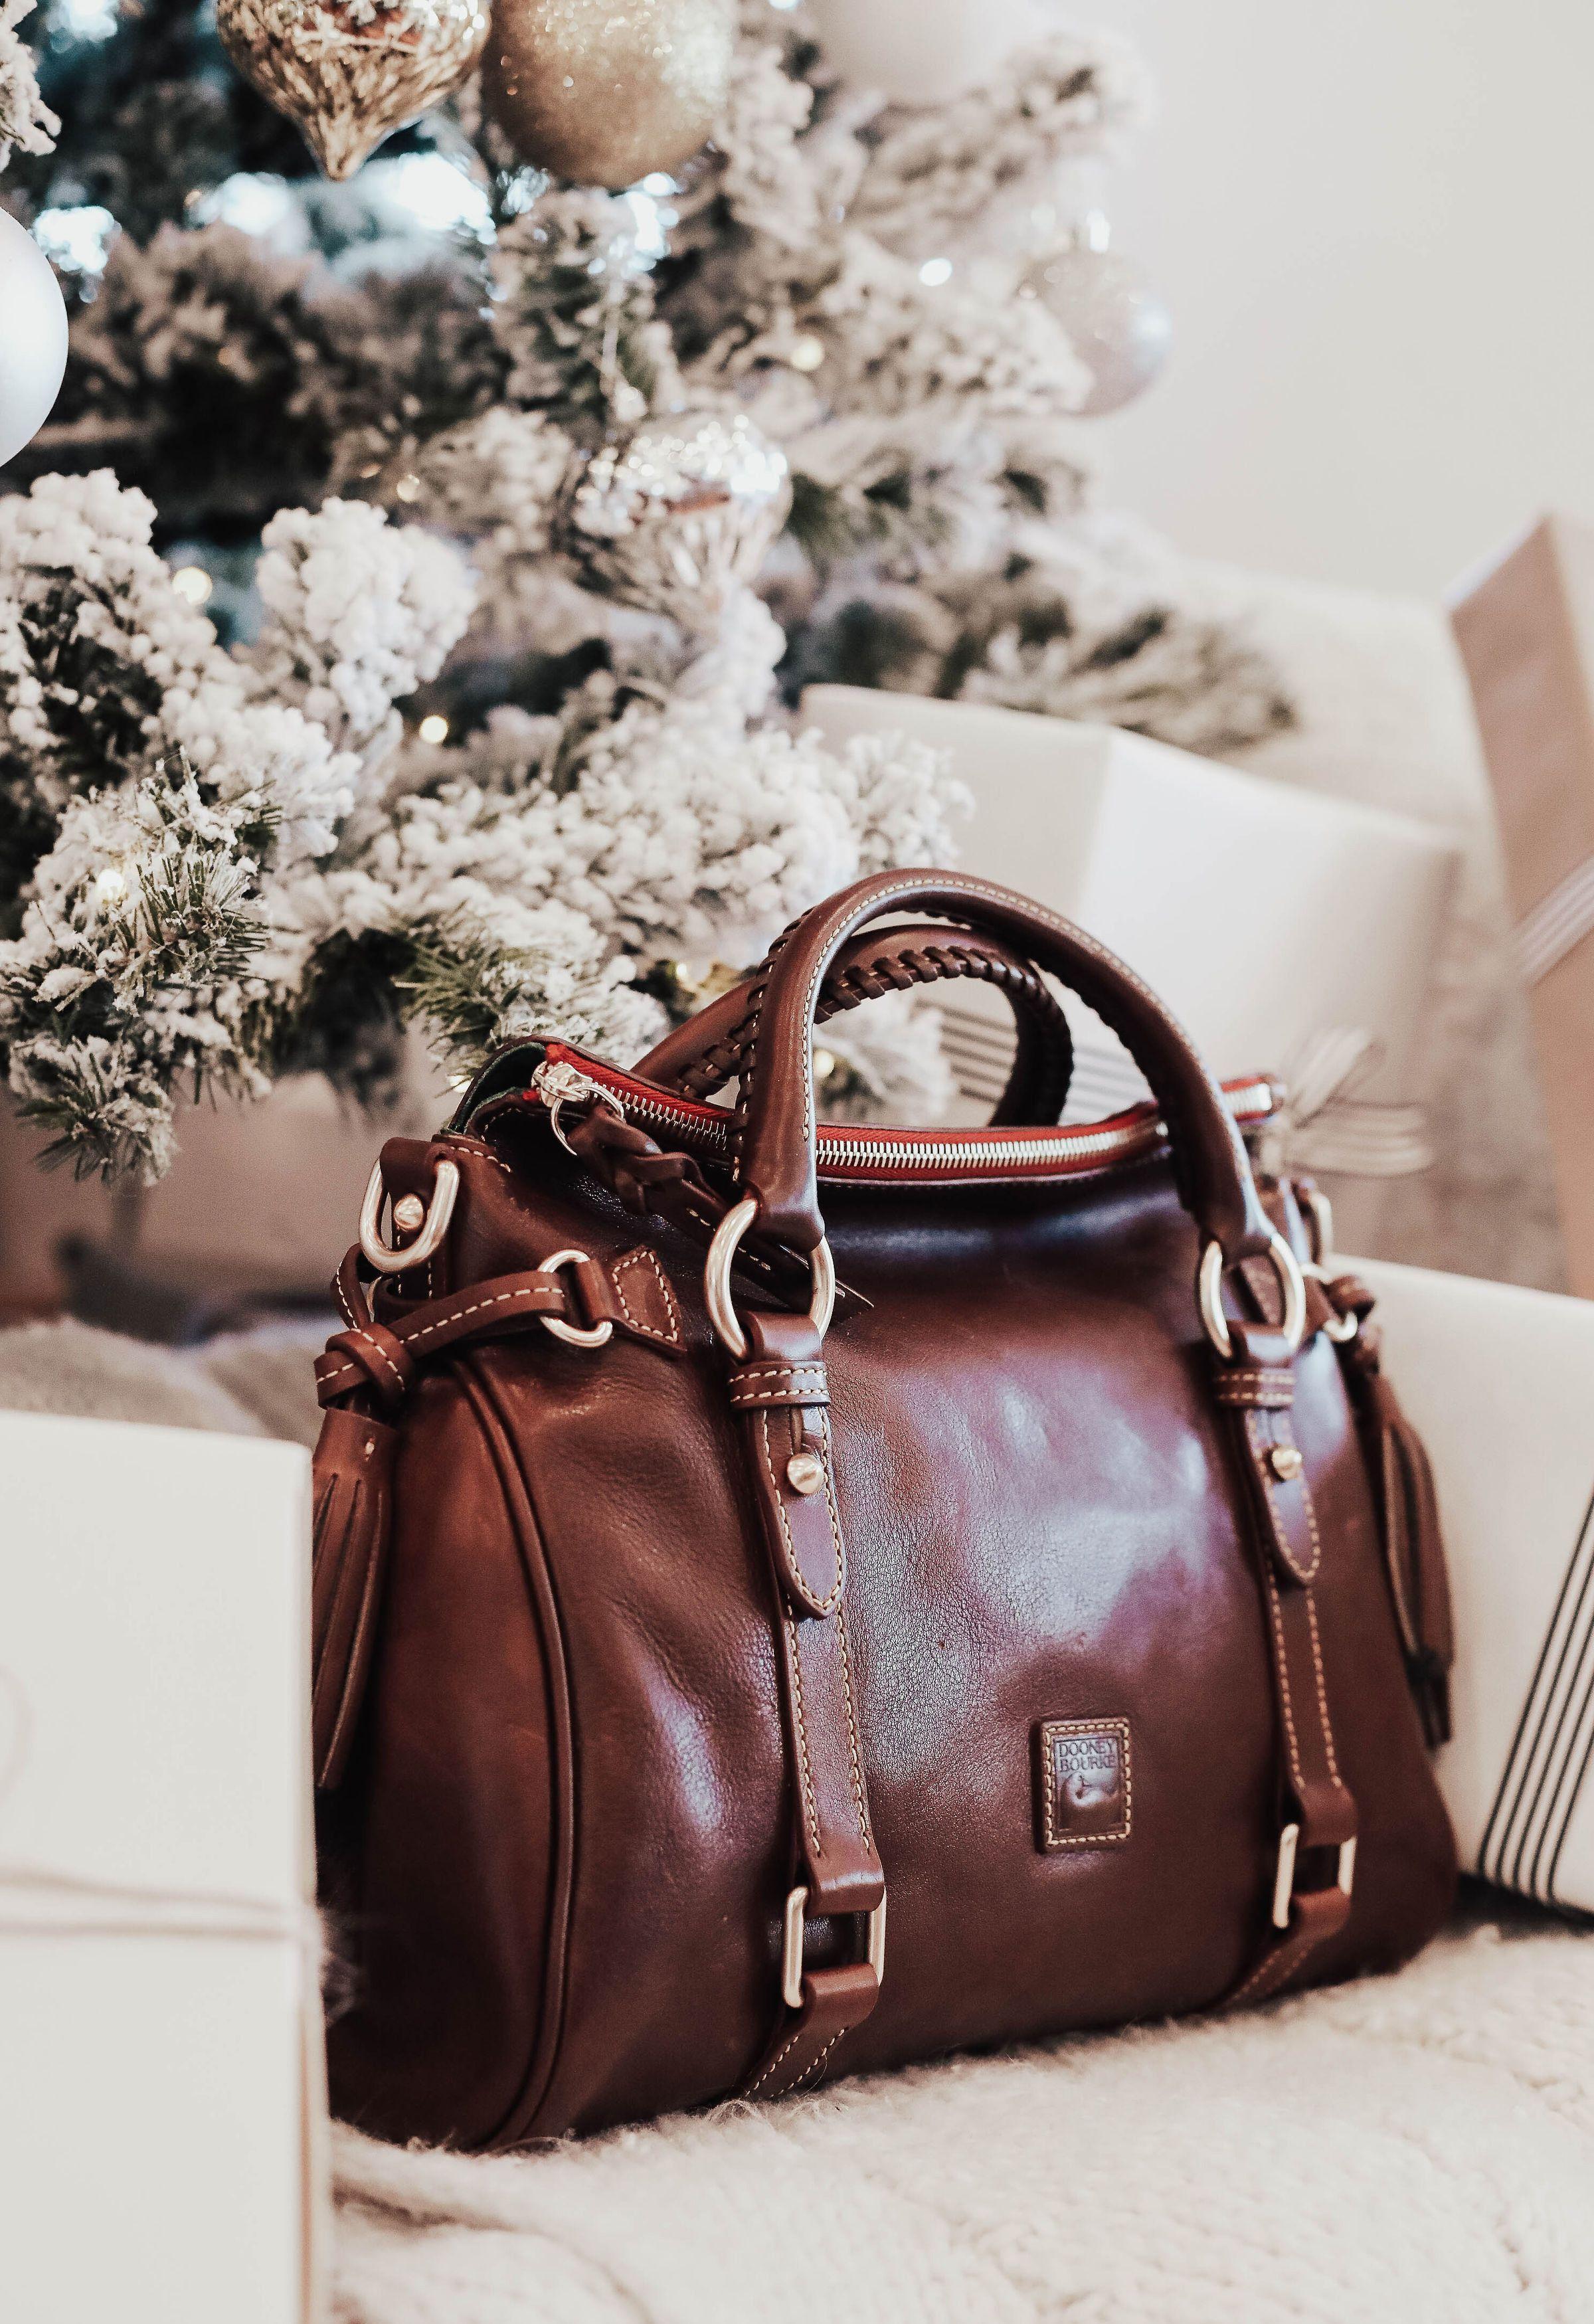 Holiday Gifting - Dooney & Bourke Handbags From Za